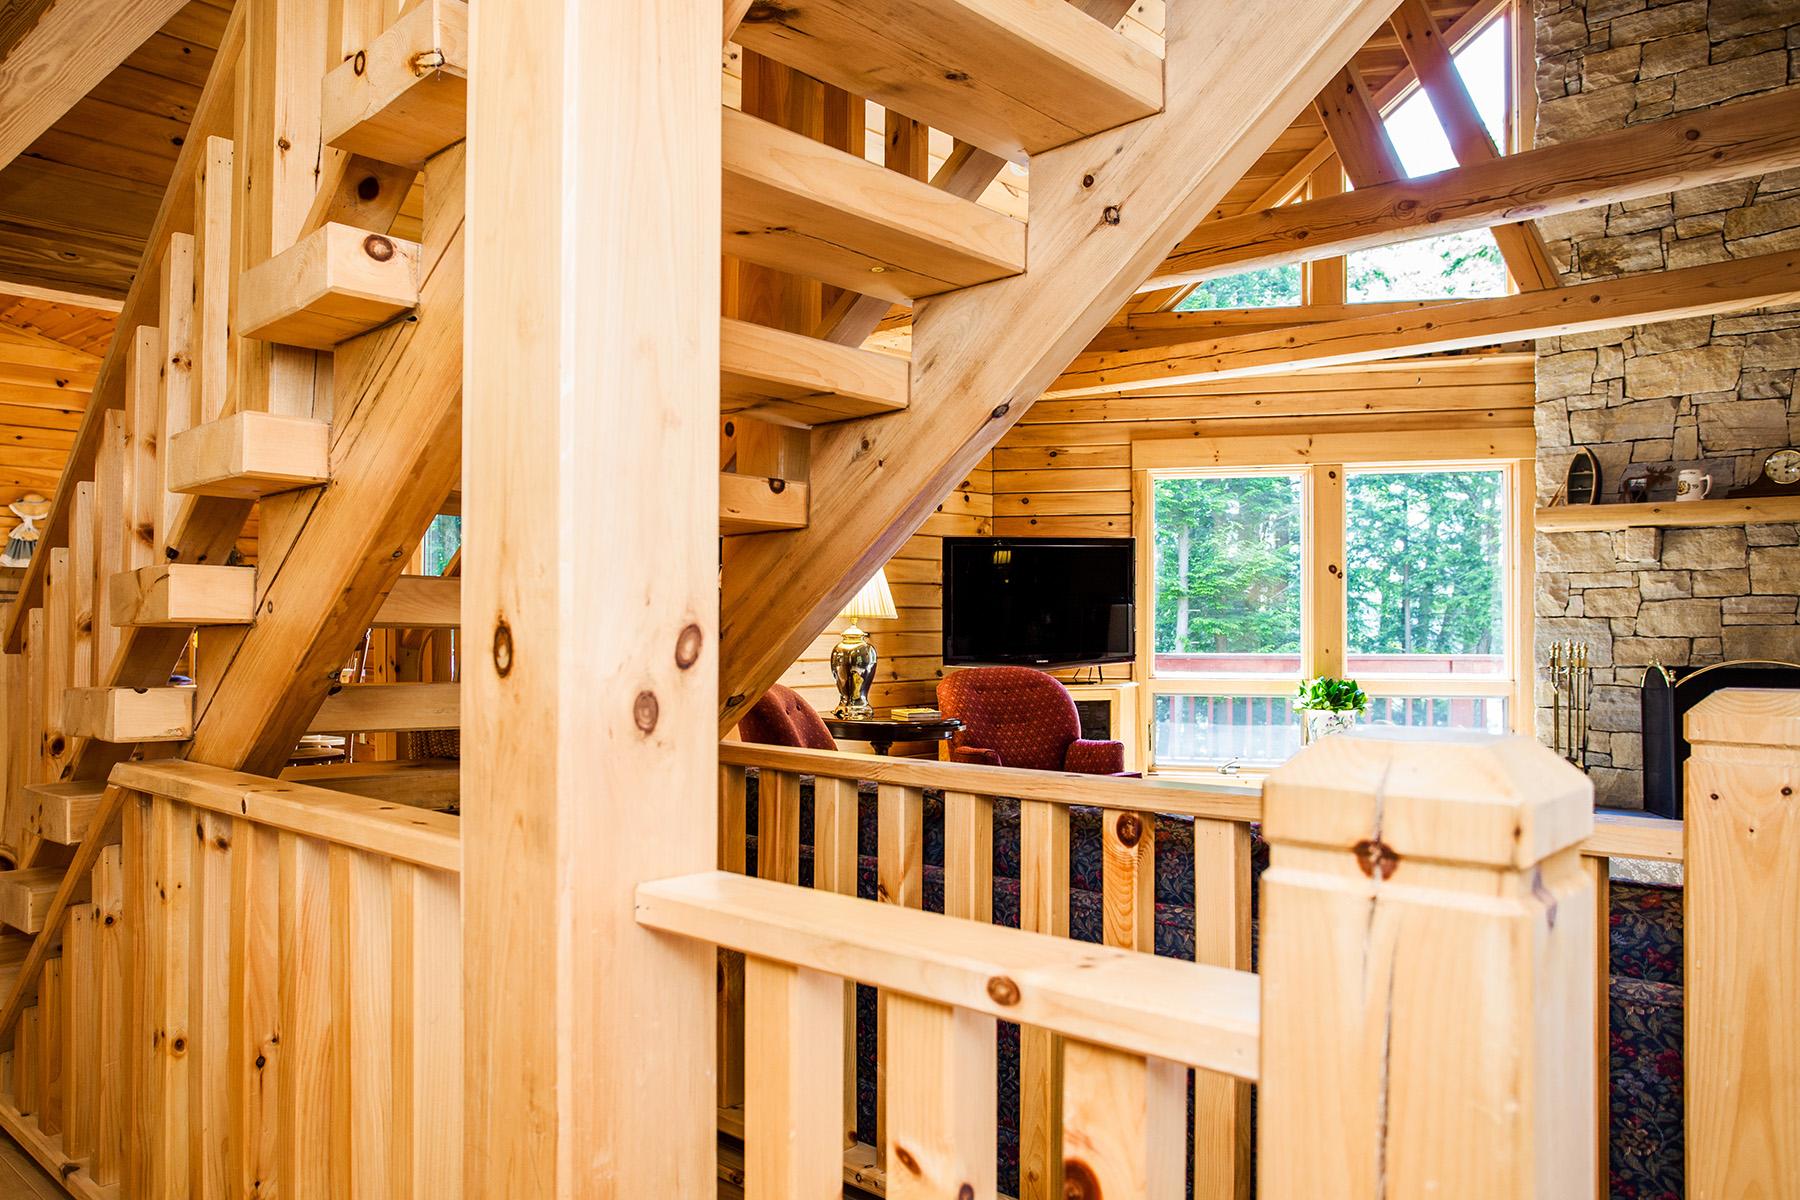 Additional photo for property listing at Lake Luzerne Log Home 337  Lake Tour Rd 苜蓿湖, 纽约州 12846 美国